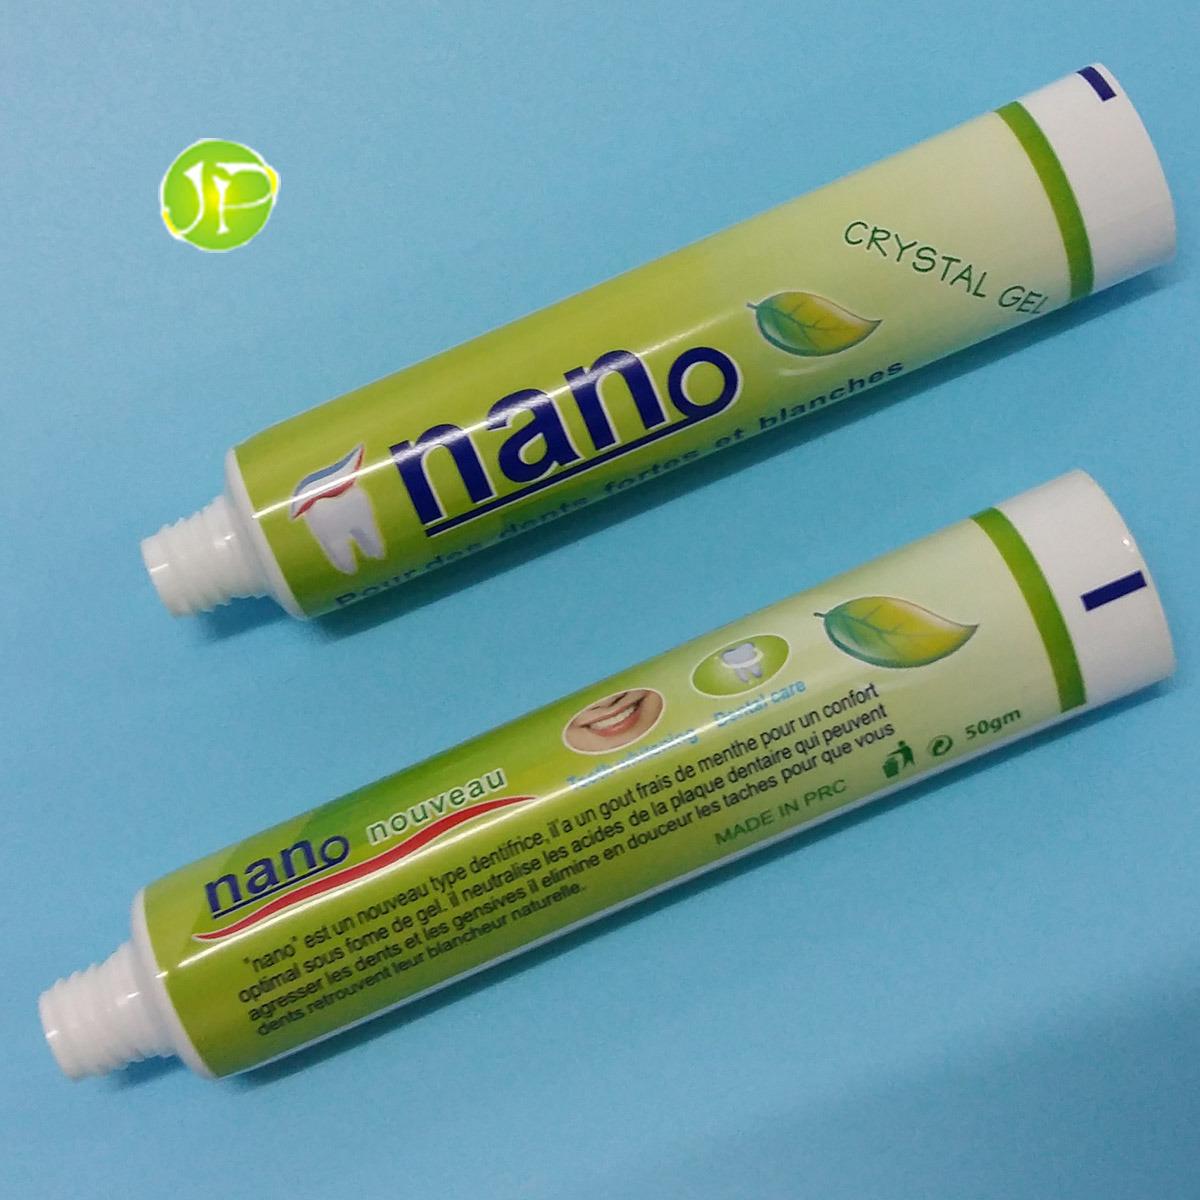 Aluminium&Plastic Tubes Toothpaste Tubes Soft Tubes Pbl Tubes